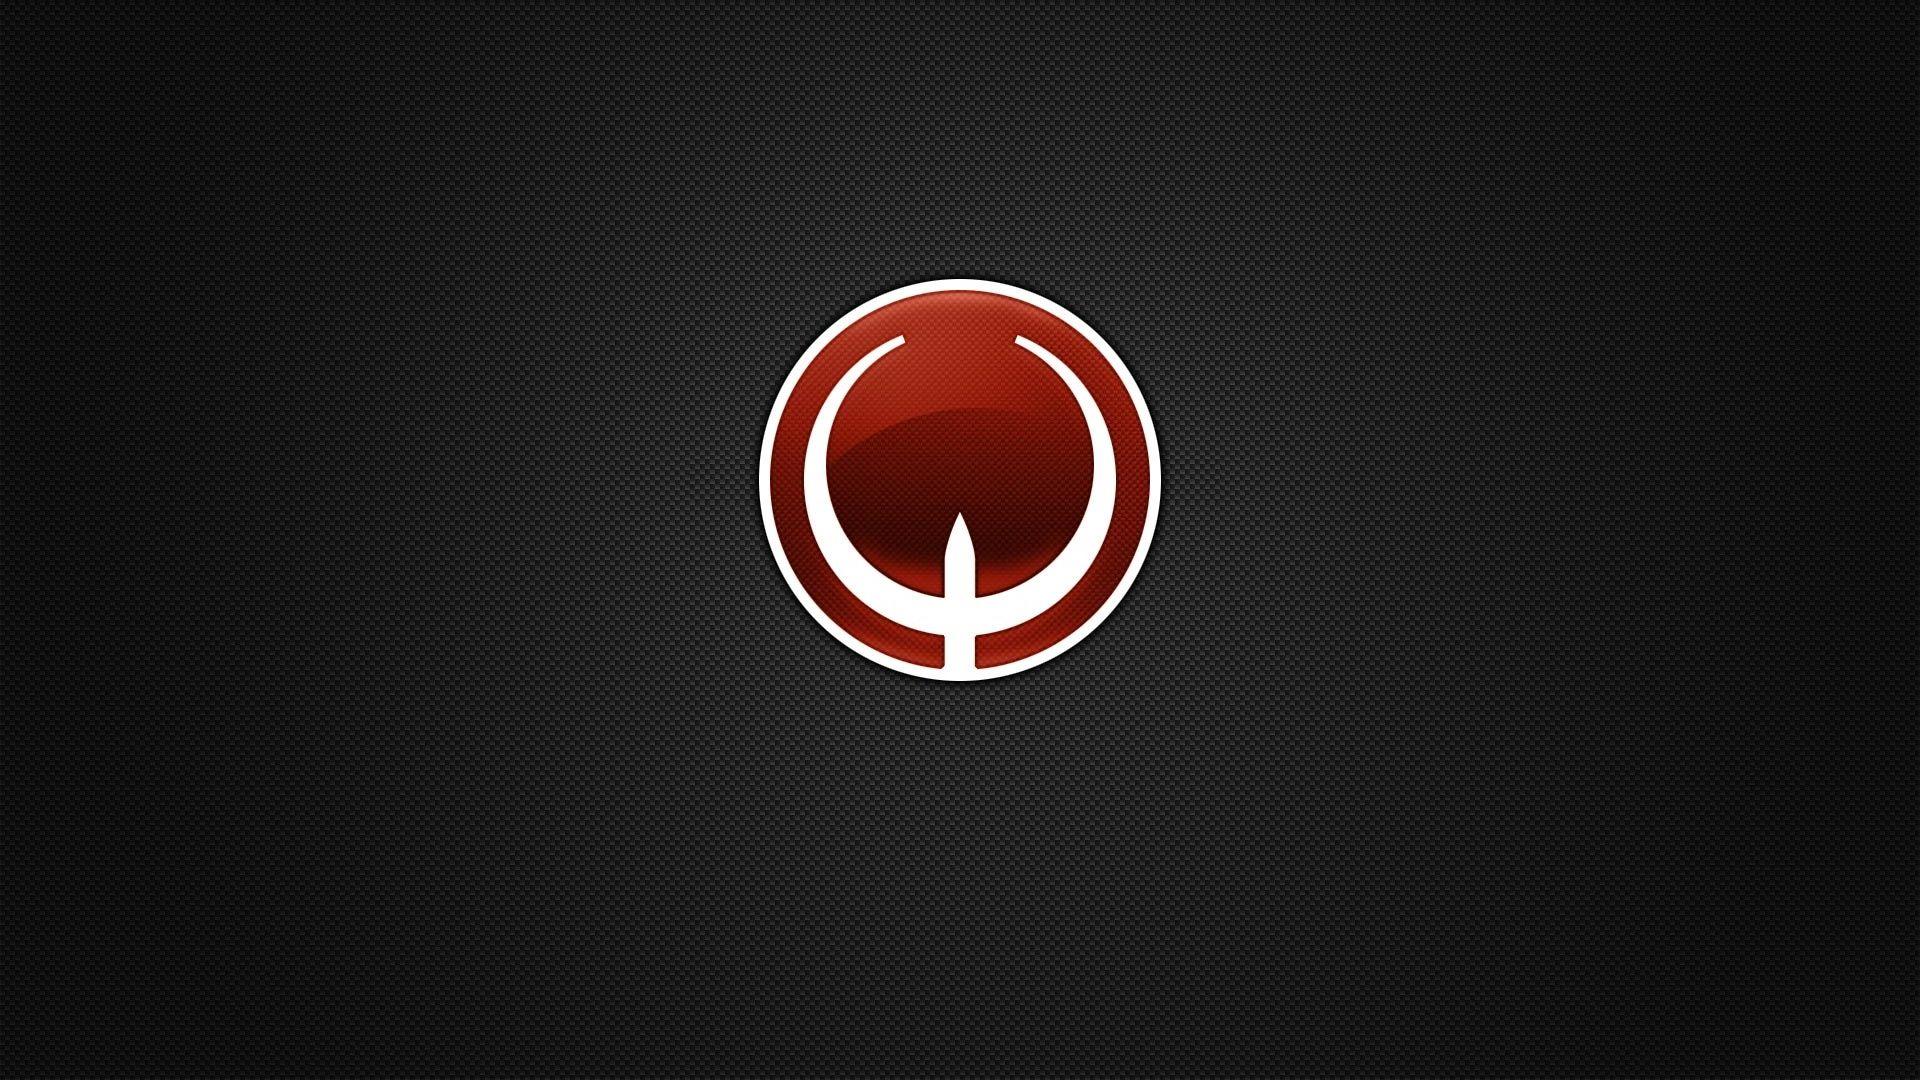 Download Quake, Symbol, Circle, Background, Shadow Wallpaper